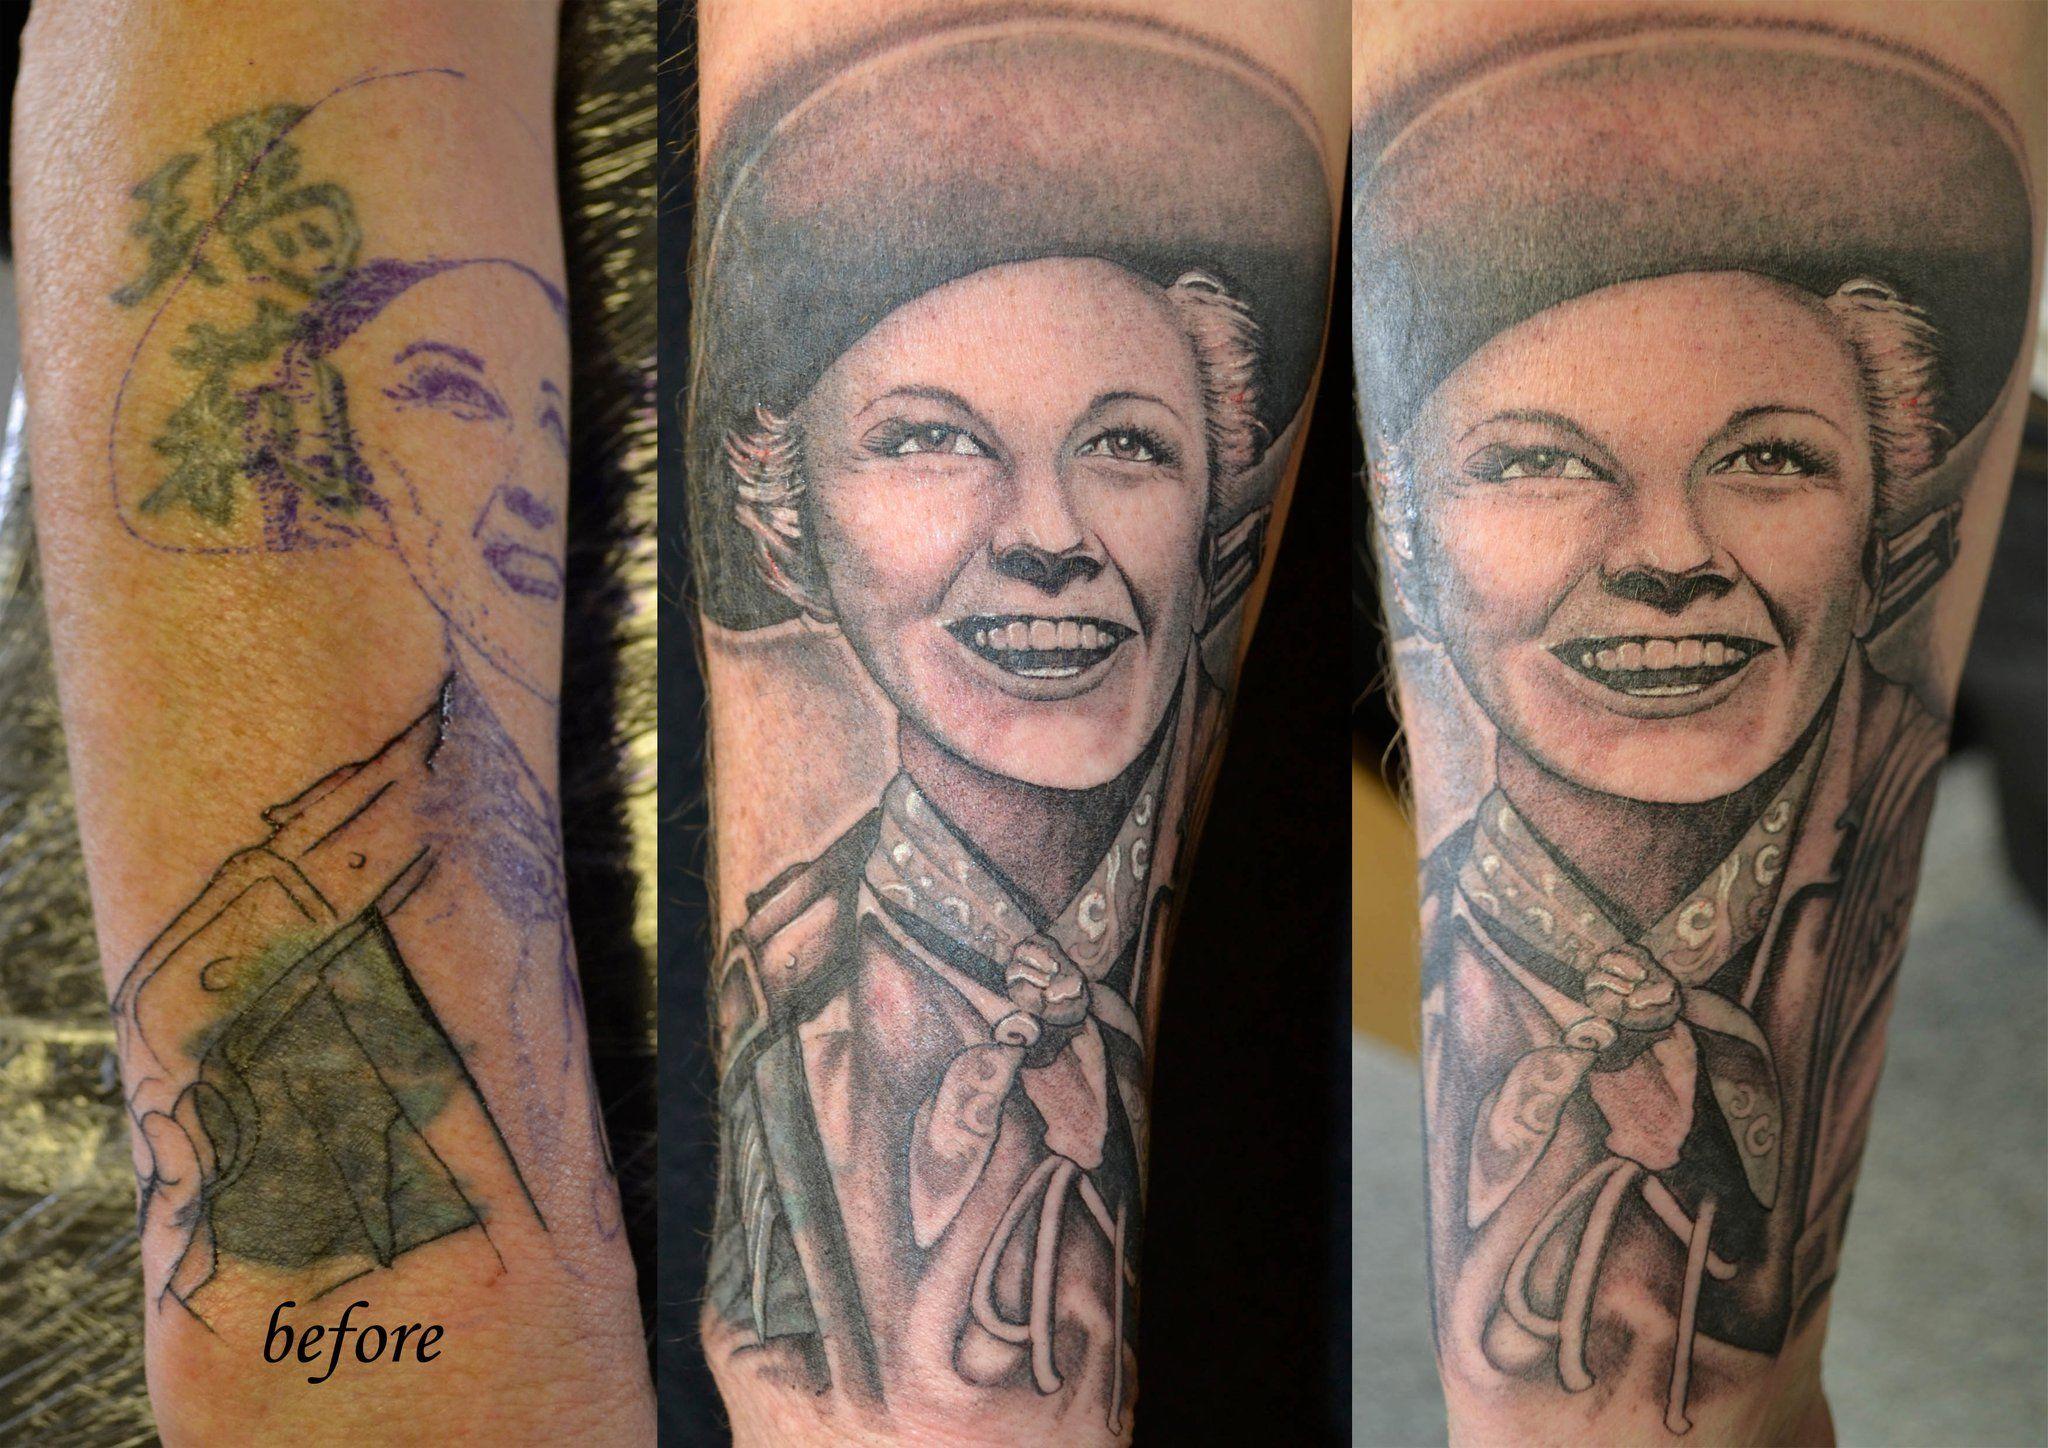 Ink Doctor Tattoo Studio